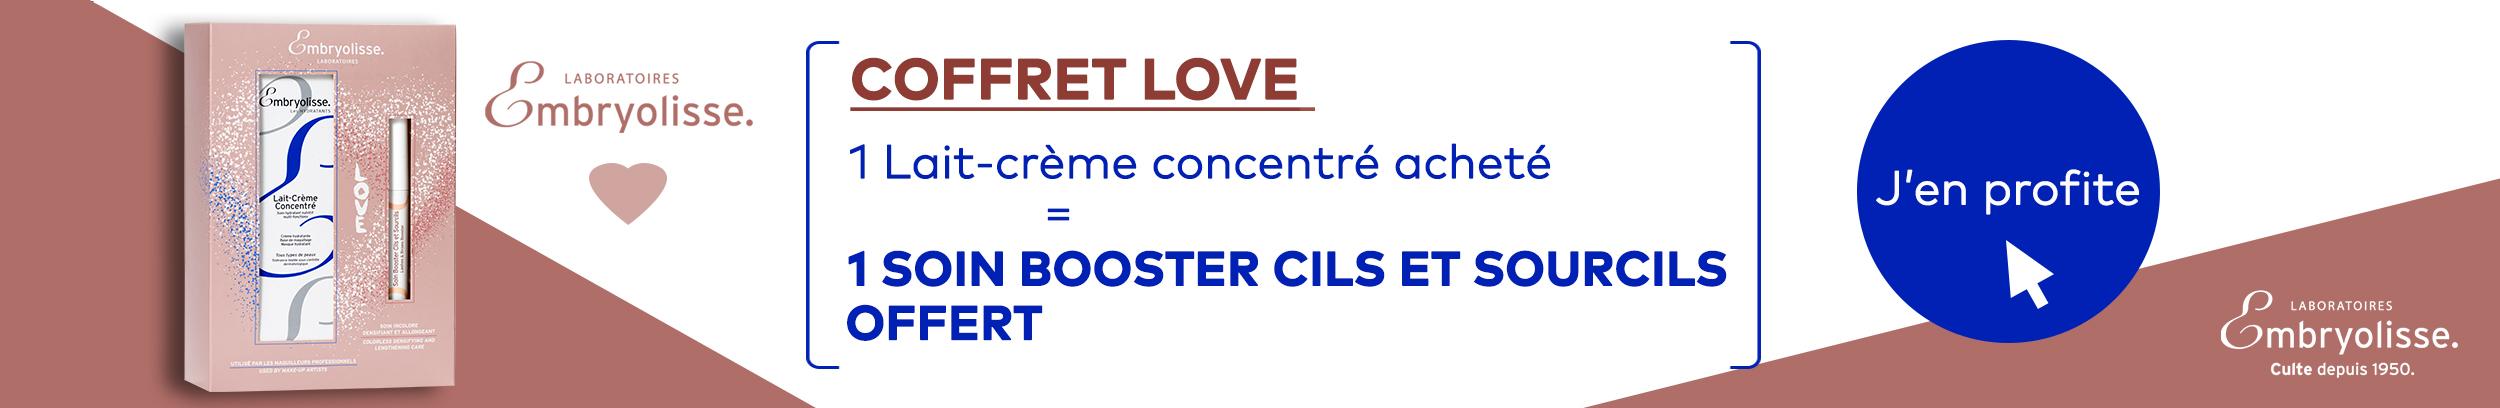 COFFRET LOVE - EMBRYOLISSE